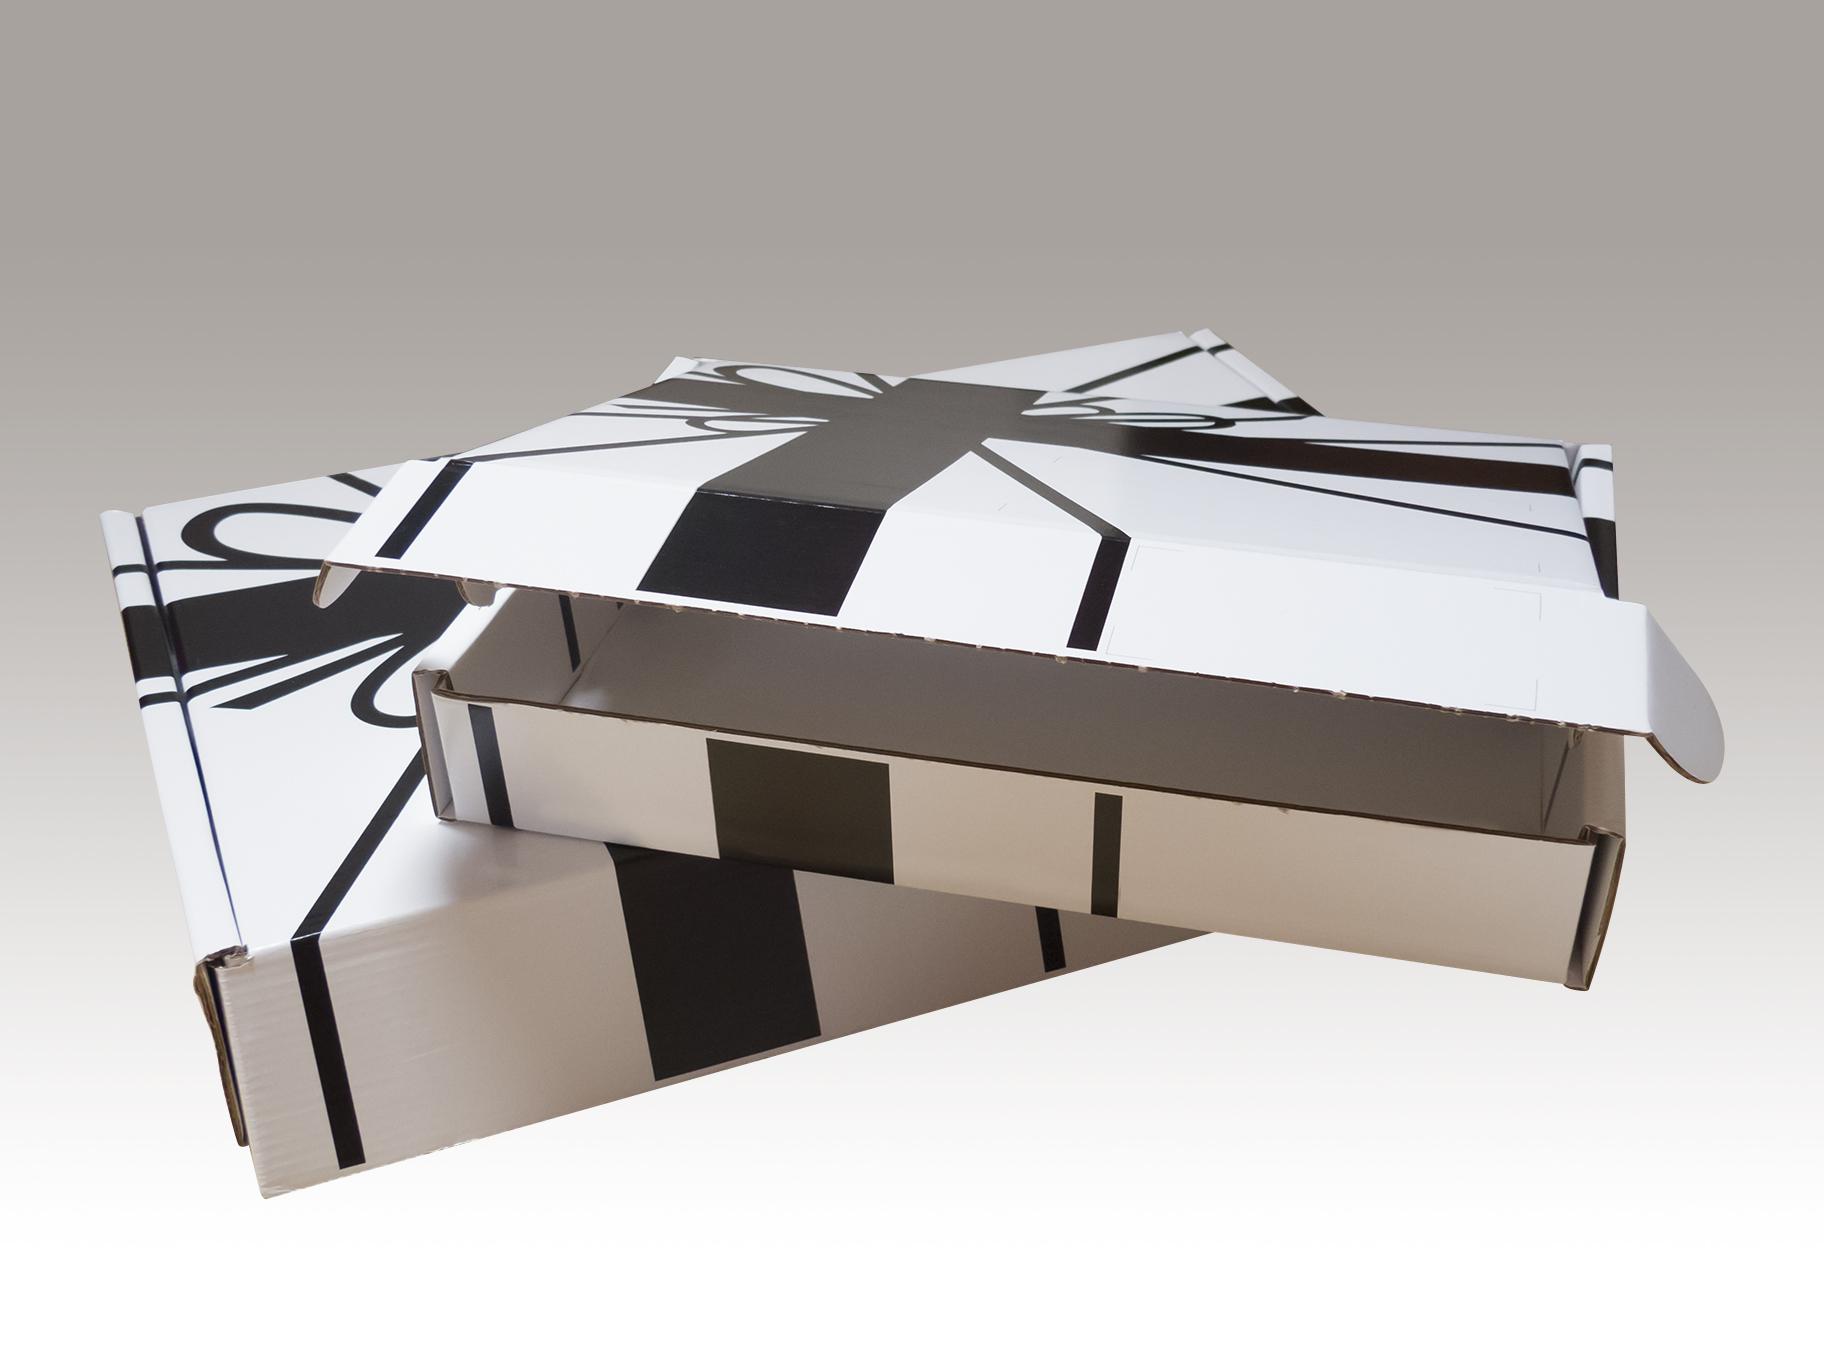 bedruckter-Karton2